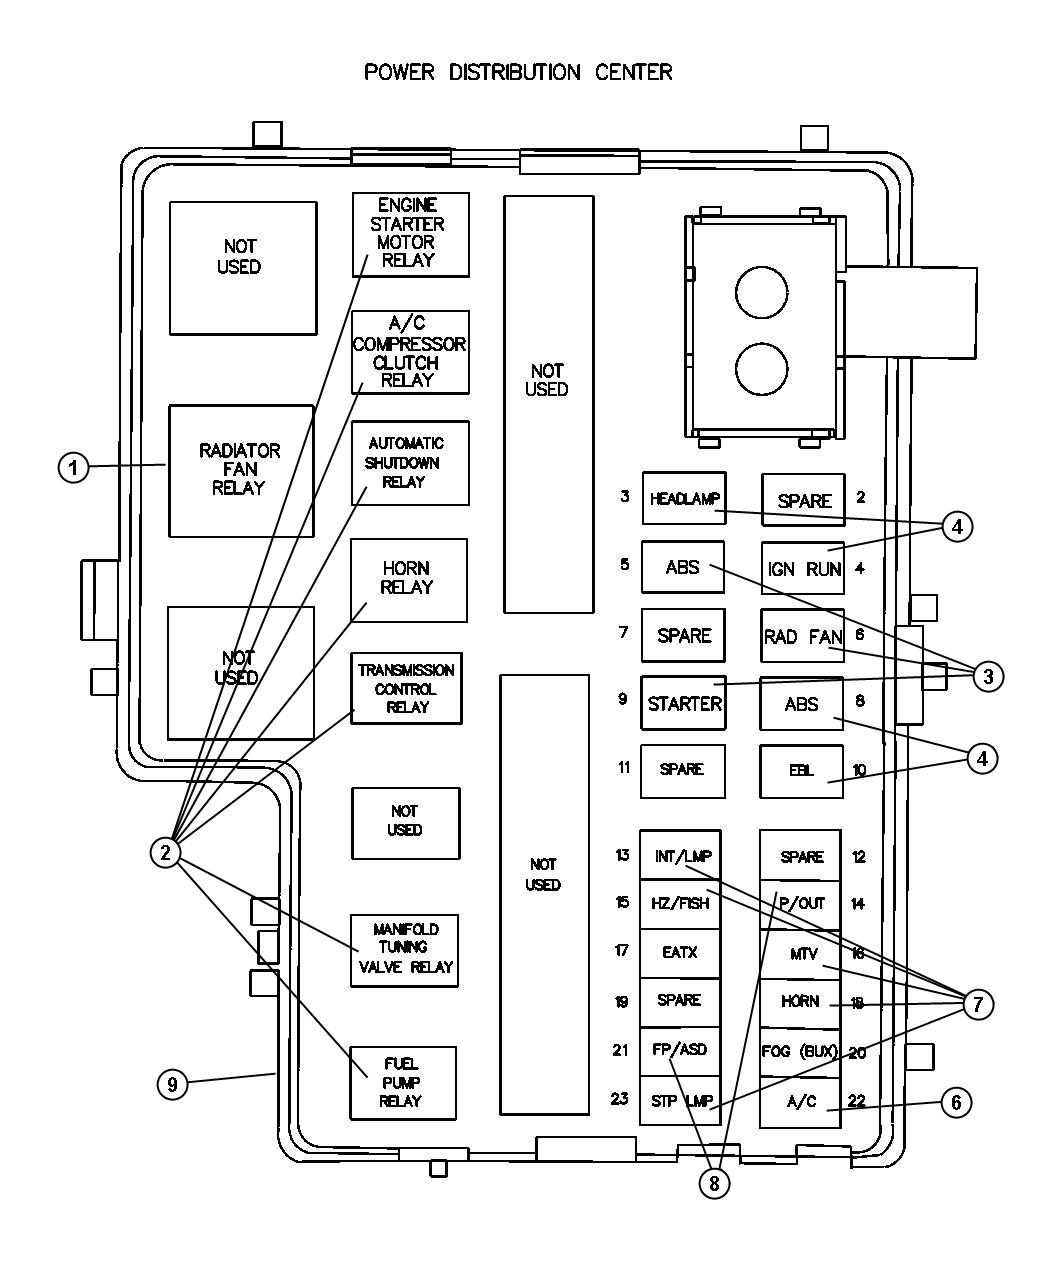 Diagram Dodge Neon Srt Fuse Box Diagram Full